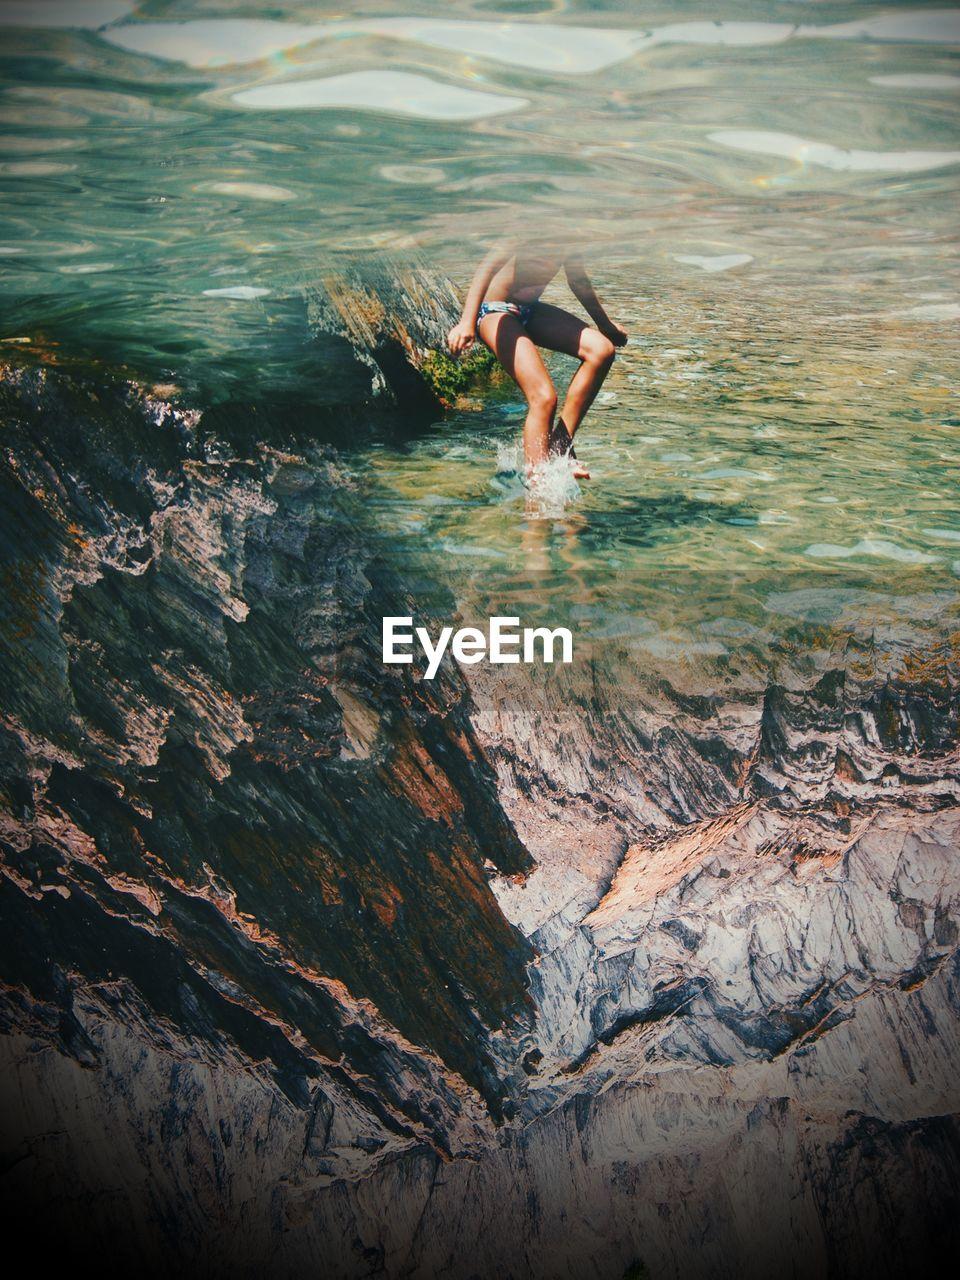 Childan jumping in sea